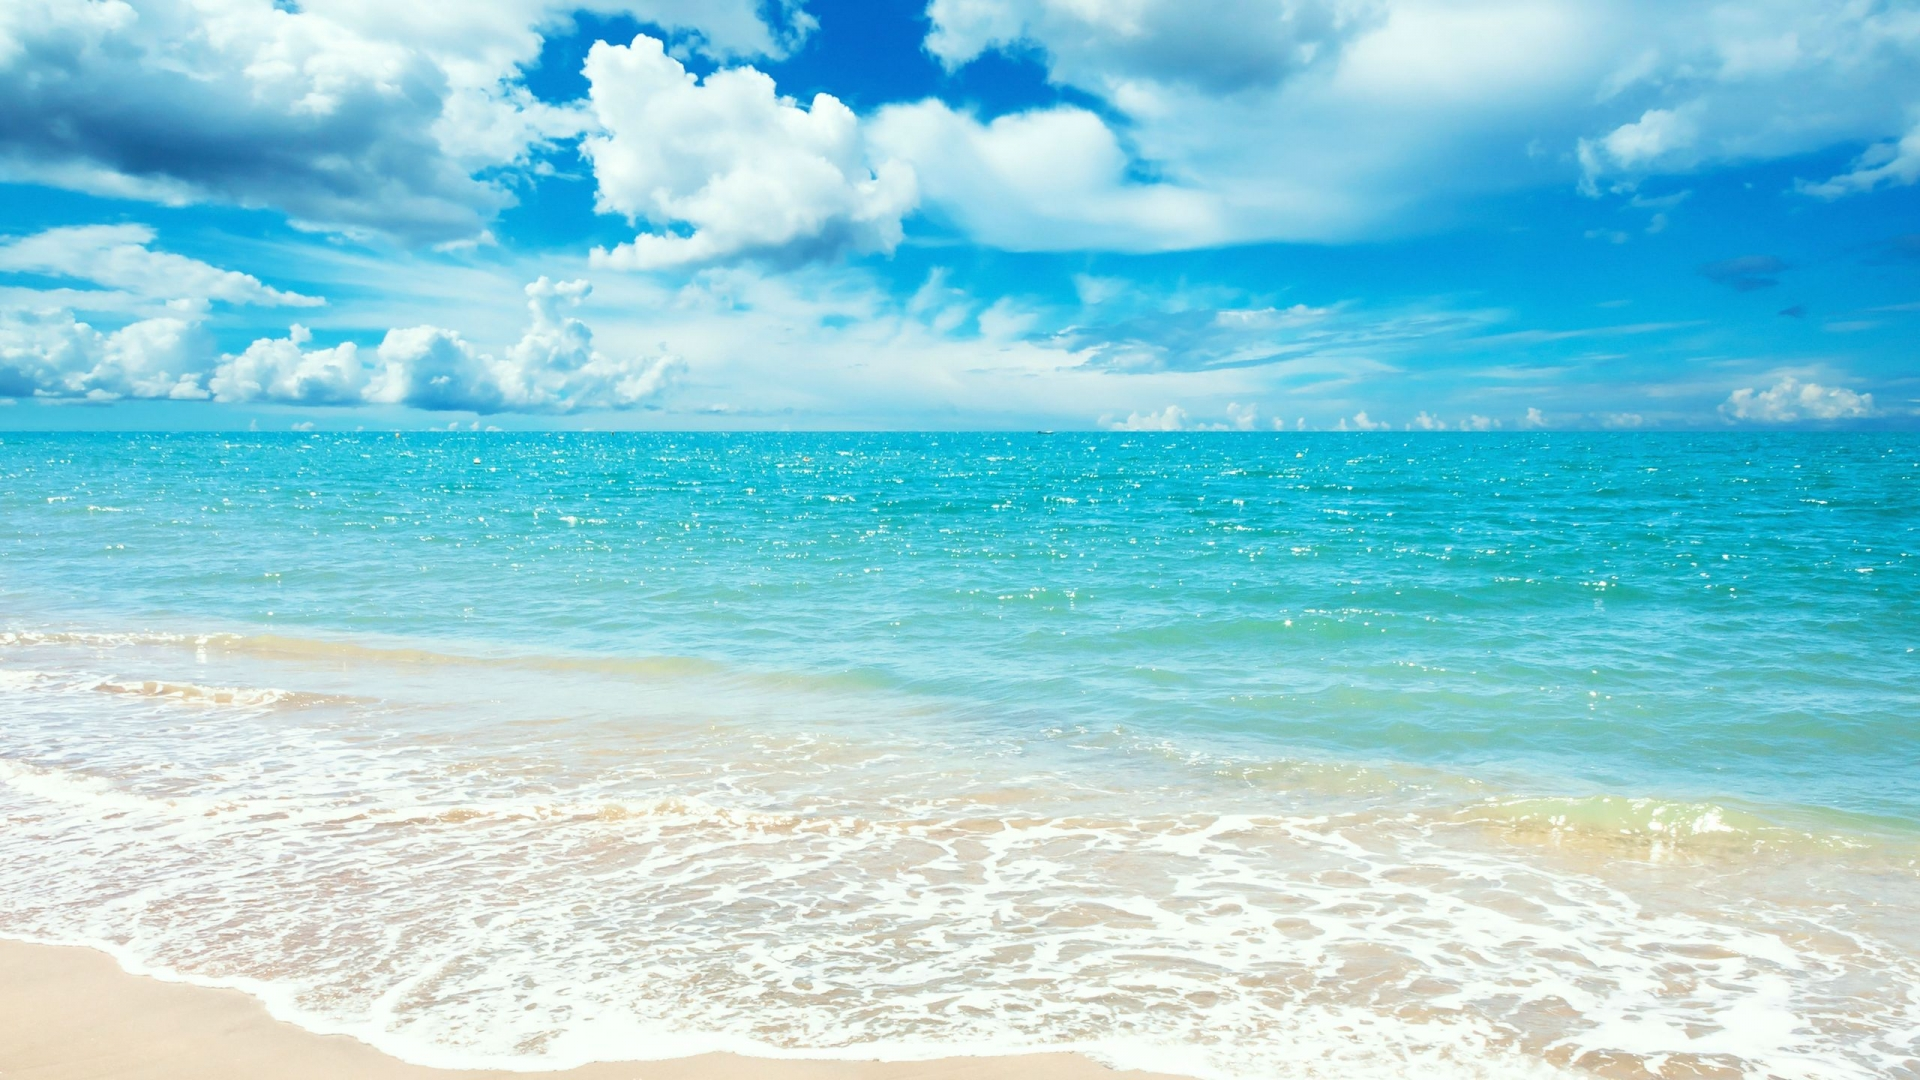 Nice-best-sea-scene-summer-season-hd-free-wallpapers